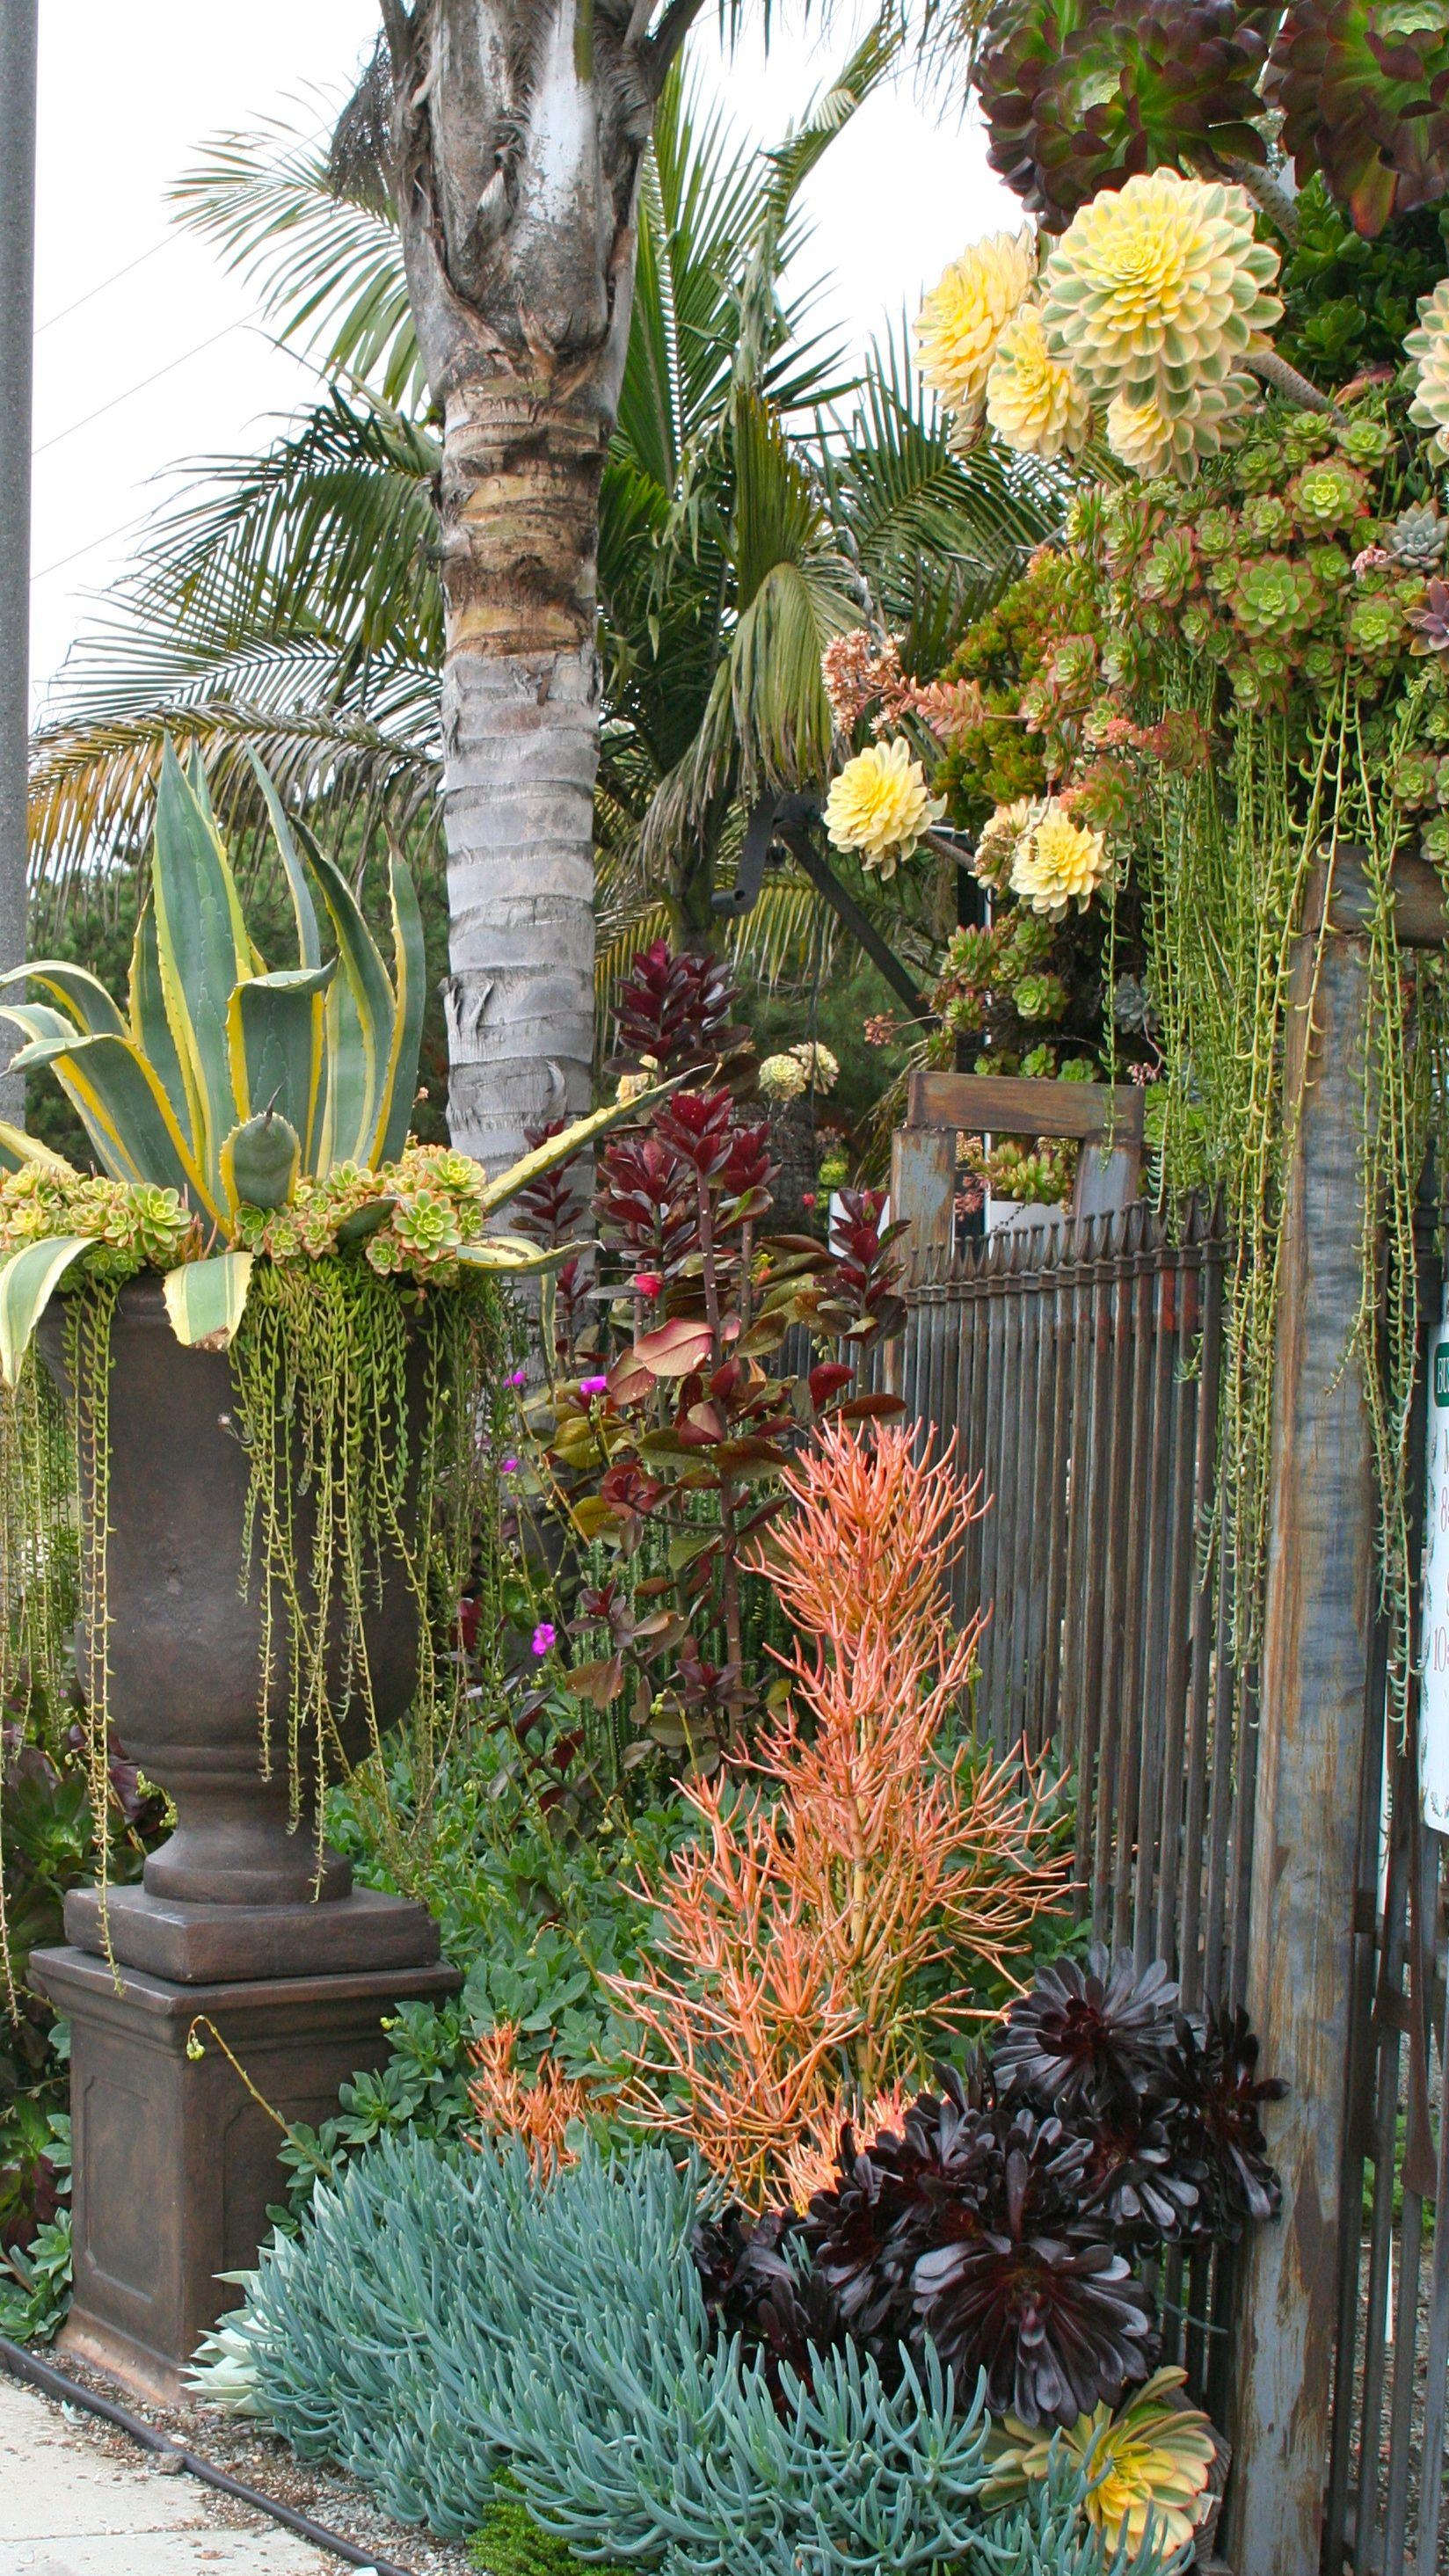 The Gardeners Anonymous Blog: Cordova Gardens—Better Than a Martini